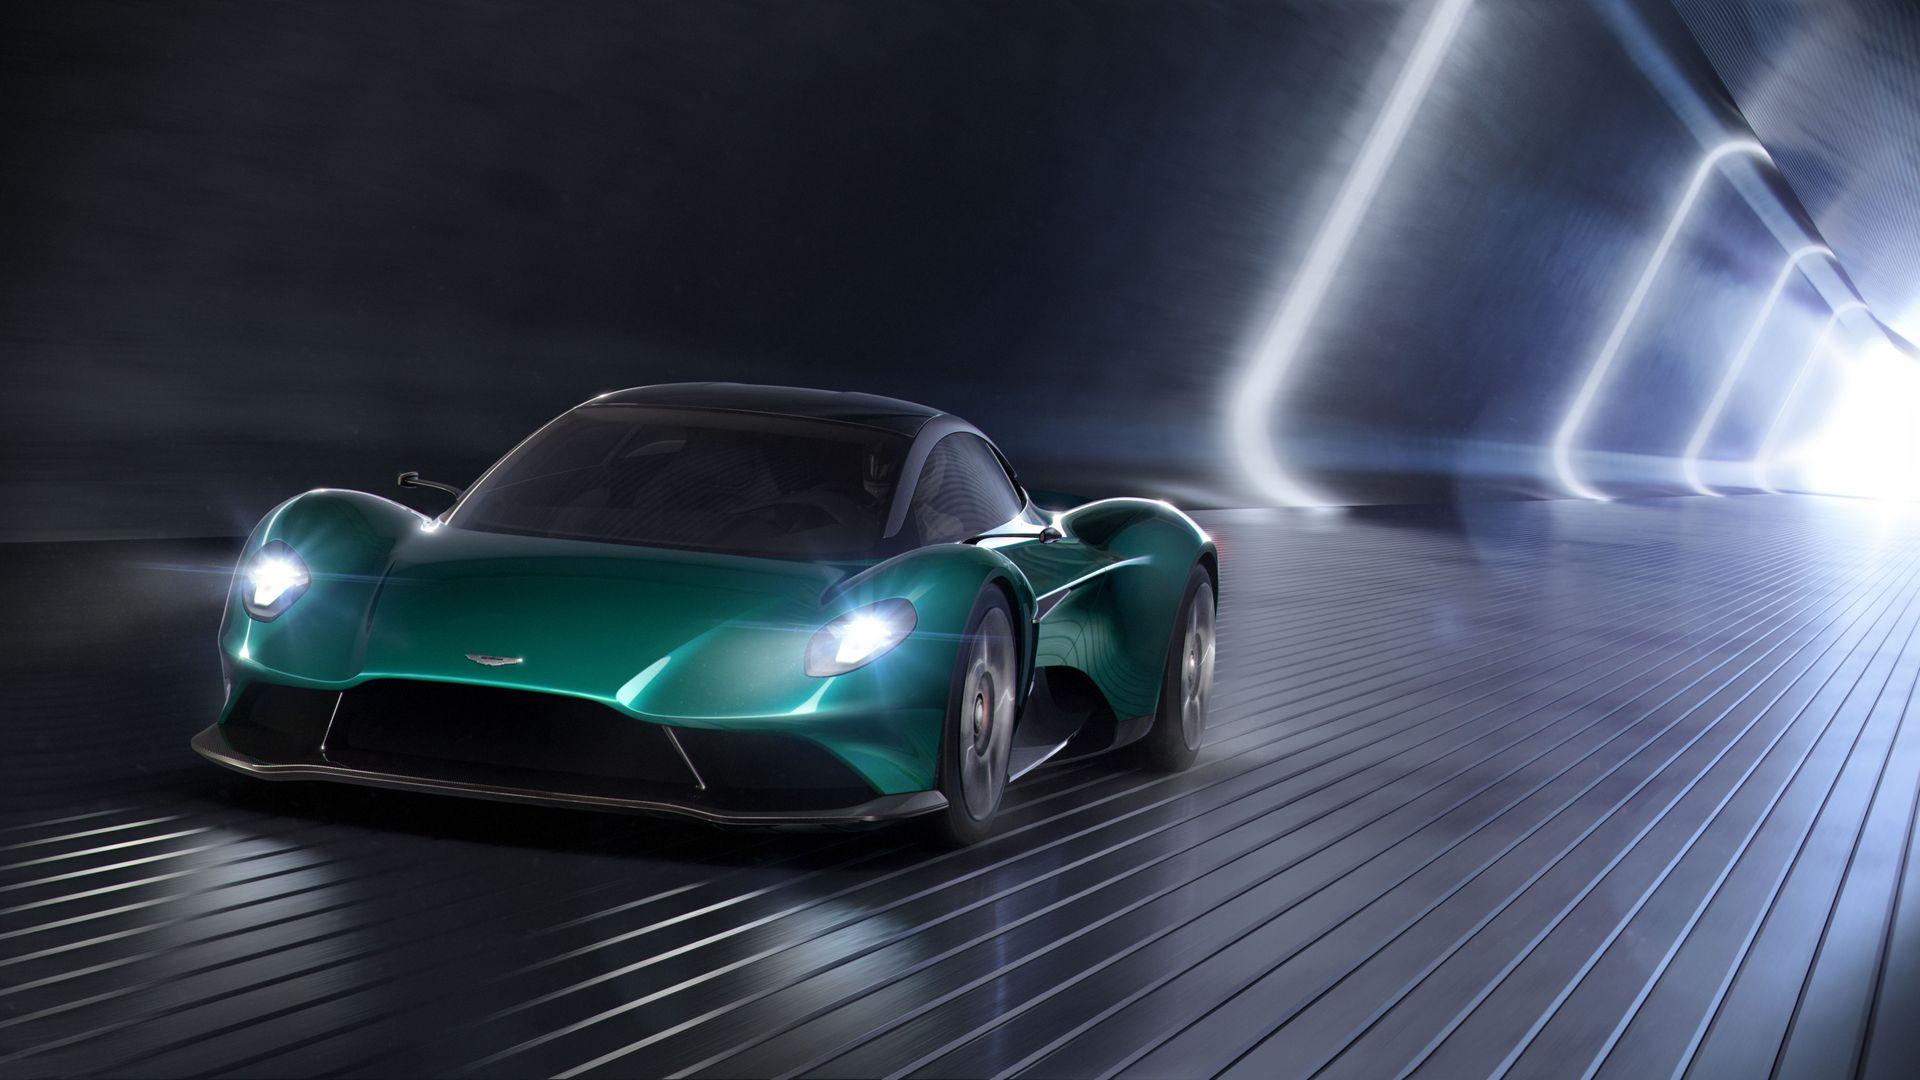 Aston Martin Vanquish Vision Concept (1)